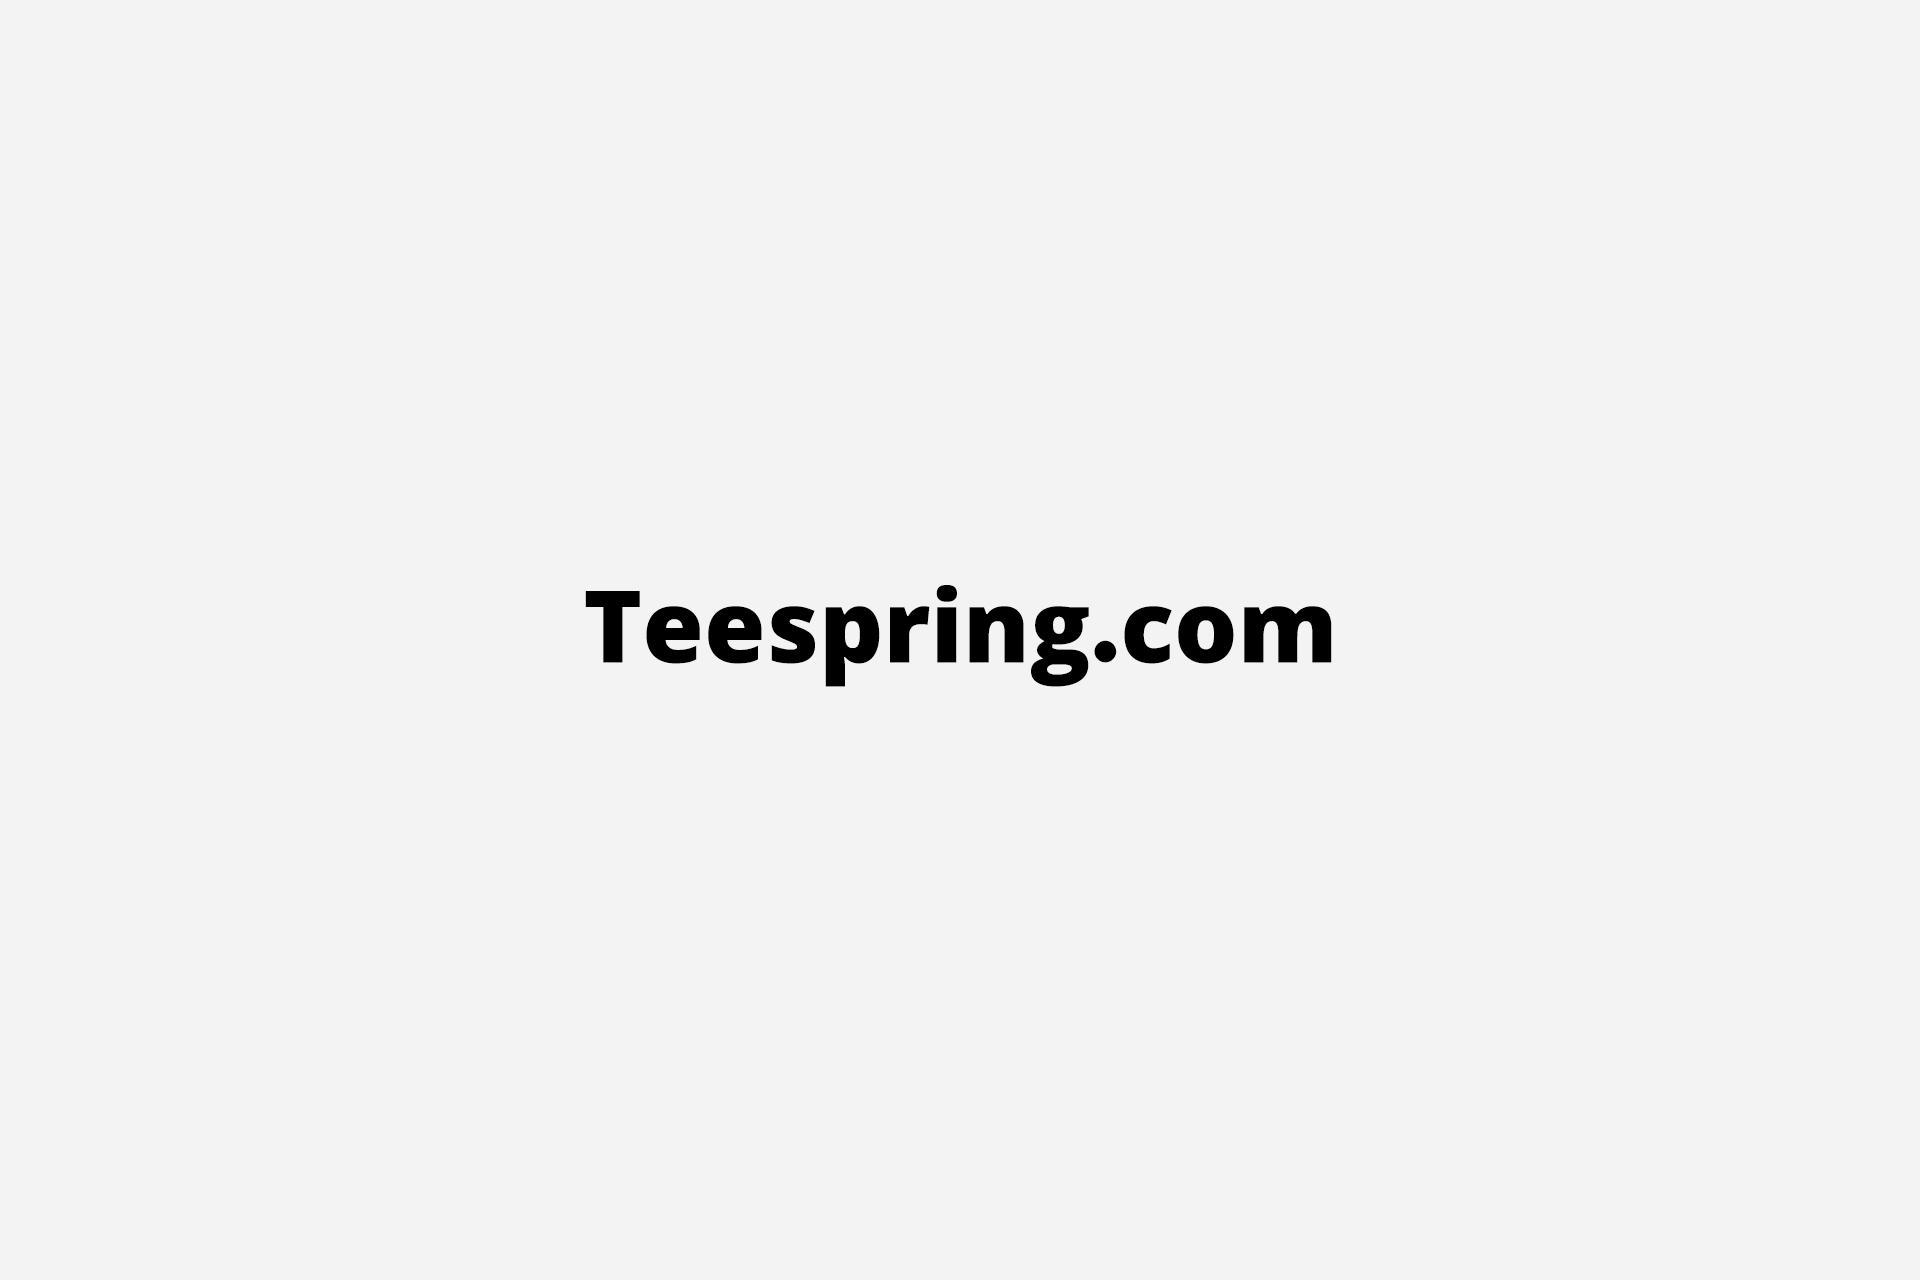 Teespring, teespring.com